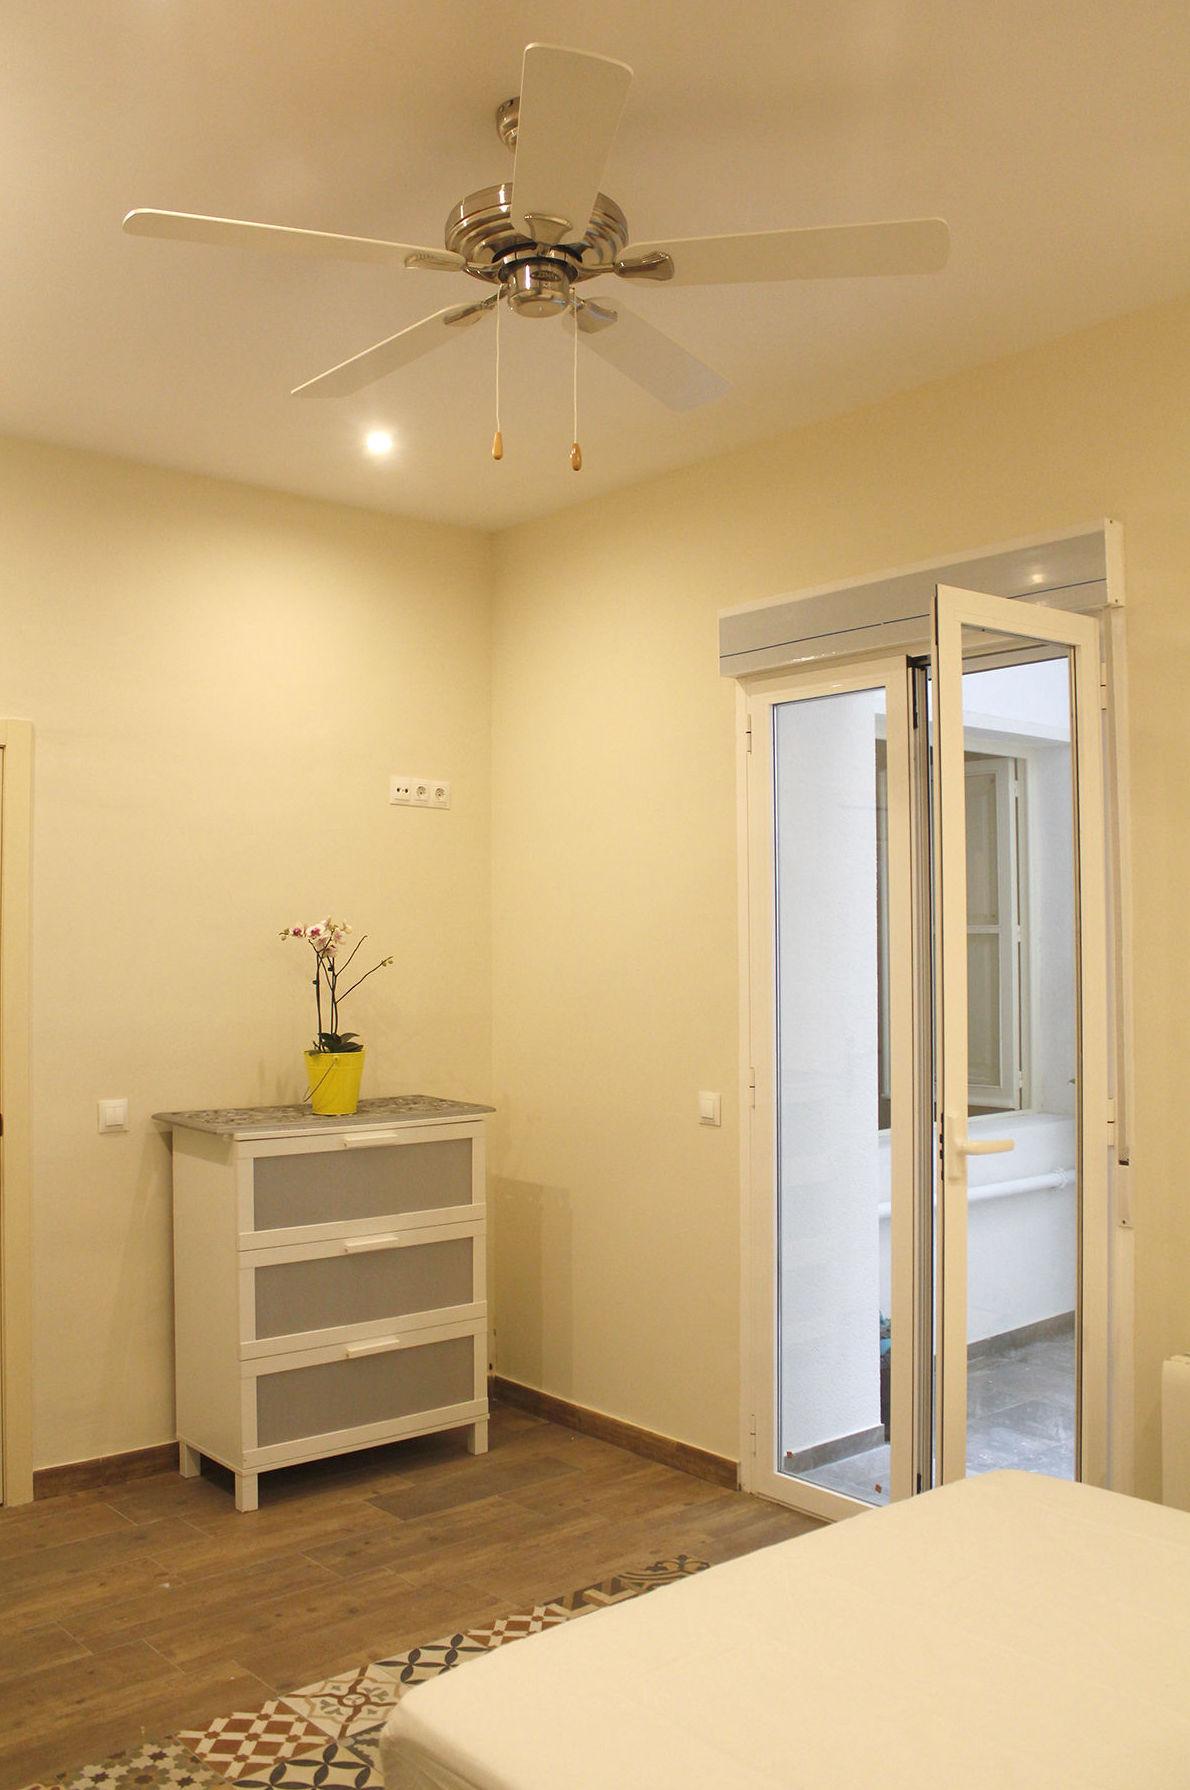 Ideas para decoración de interiores